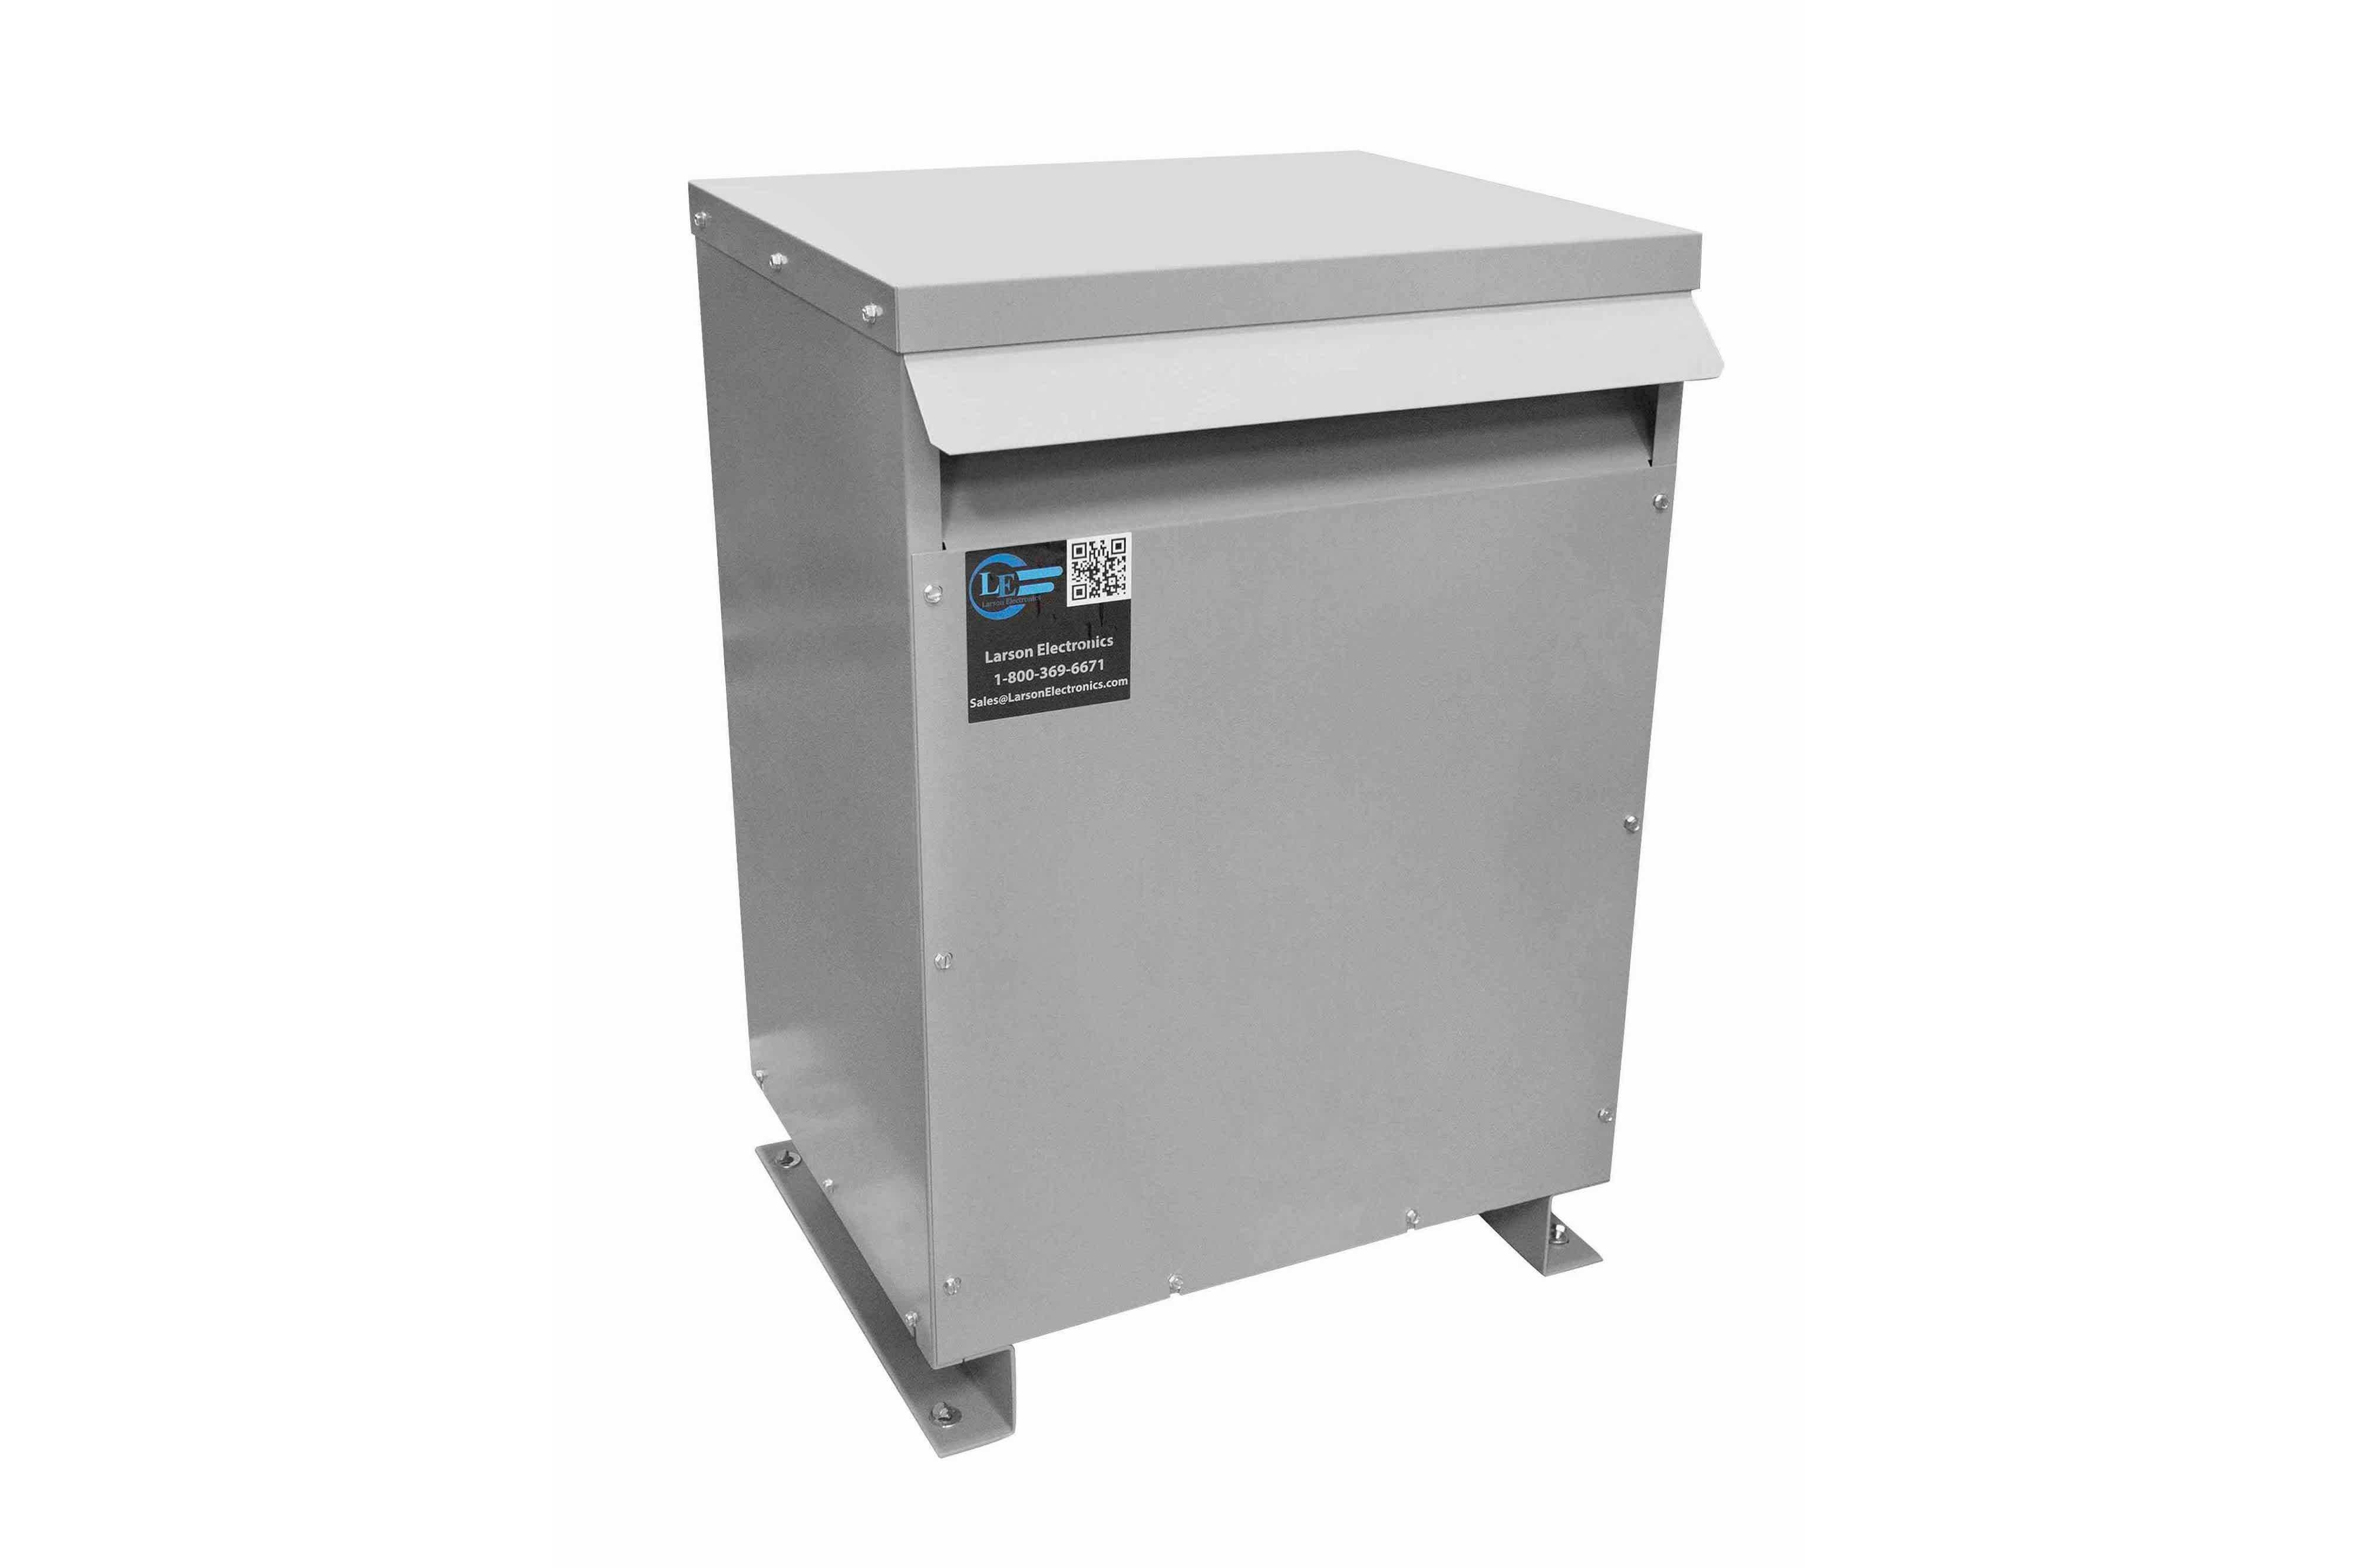 36 kVA 3PH DOE Transformer, 240V Delta Primary, 415Y/240 Wye-N Secondary, N3R, Ventilated, 60 Hz